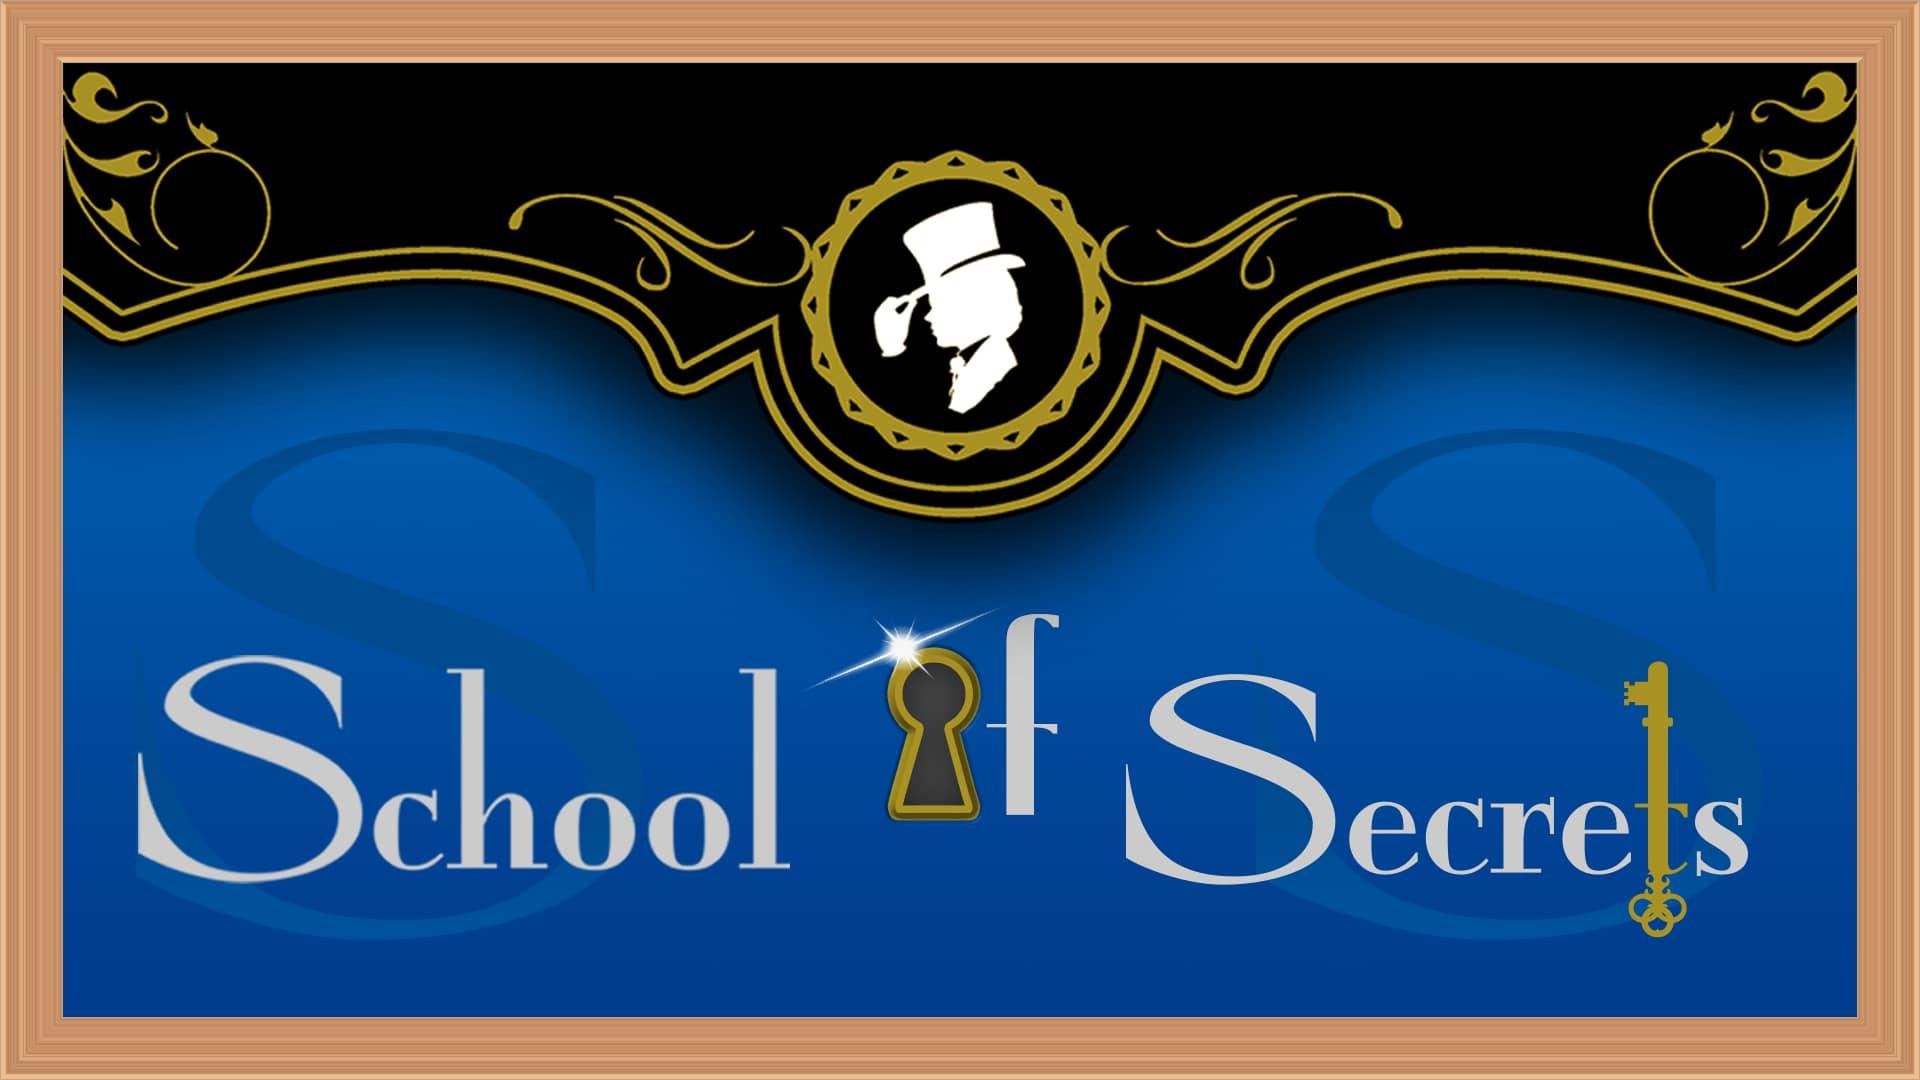 Schoolsecretslogoblue